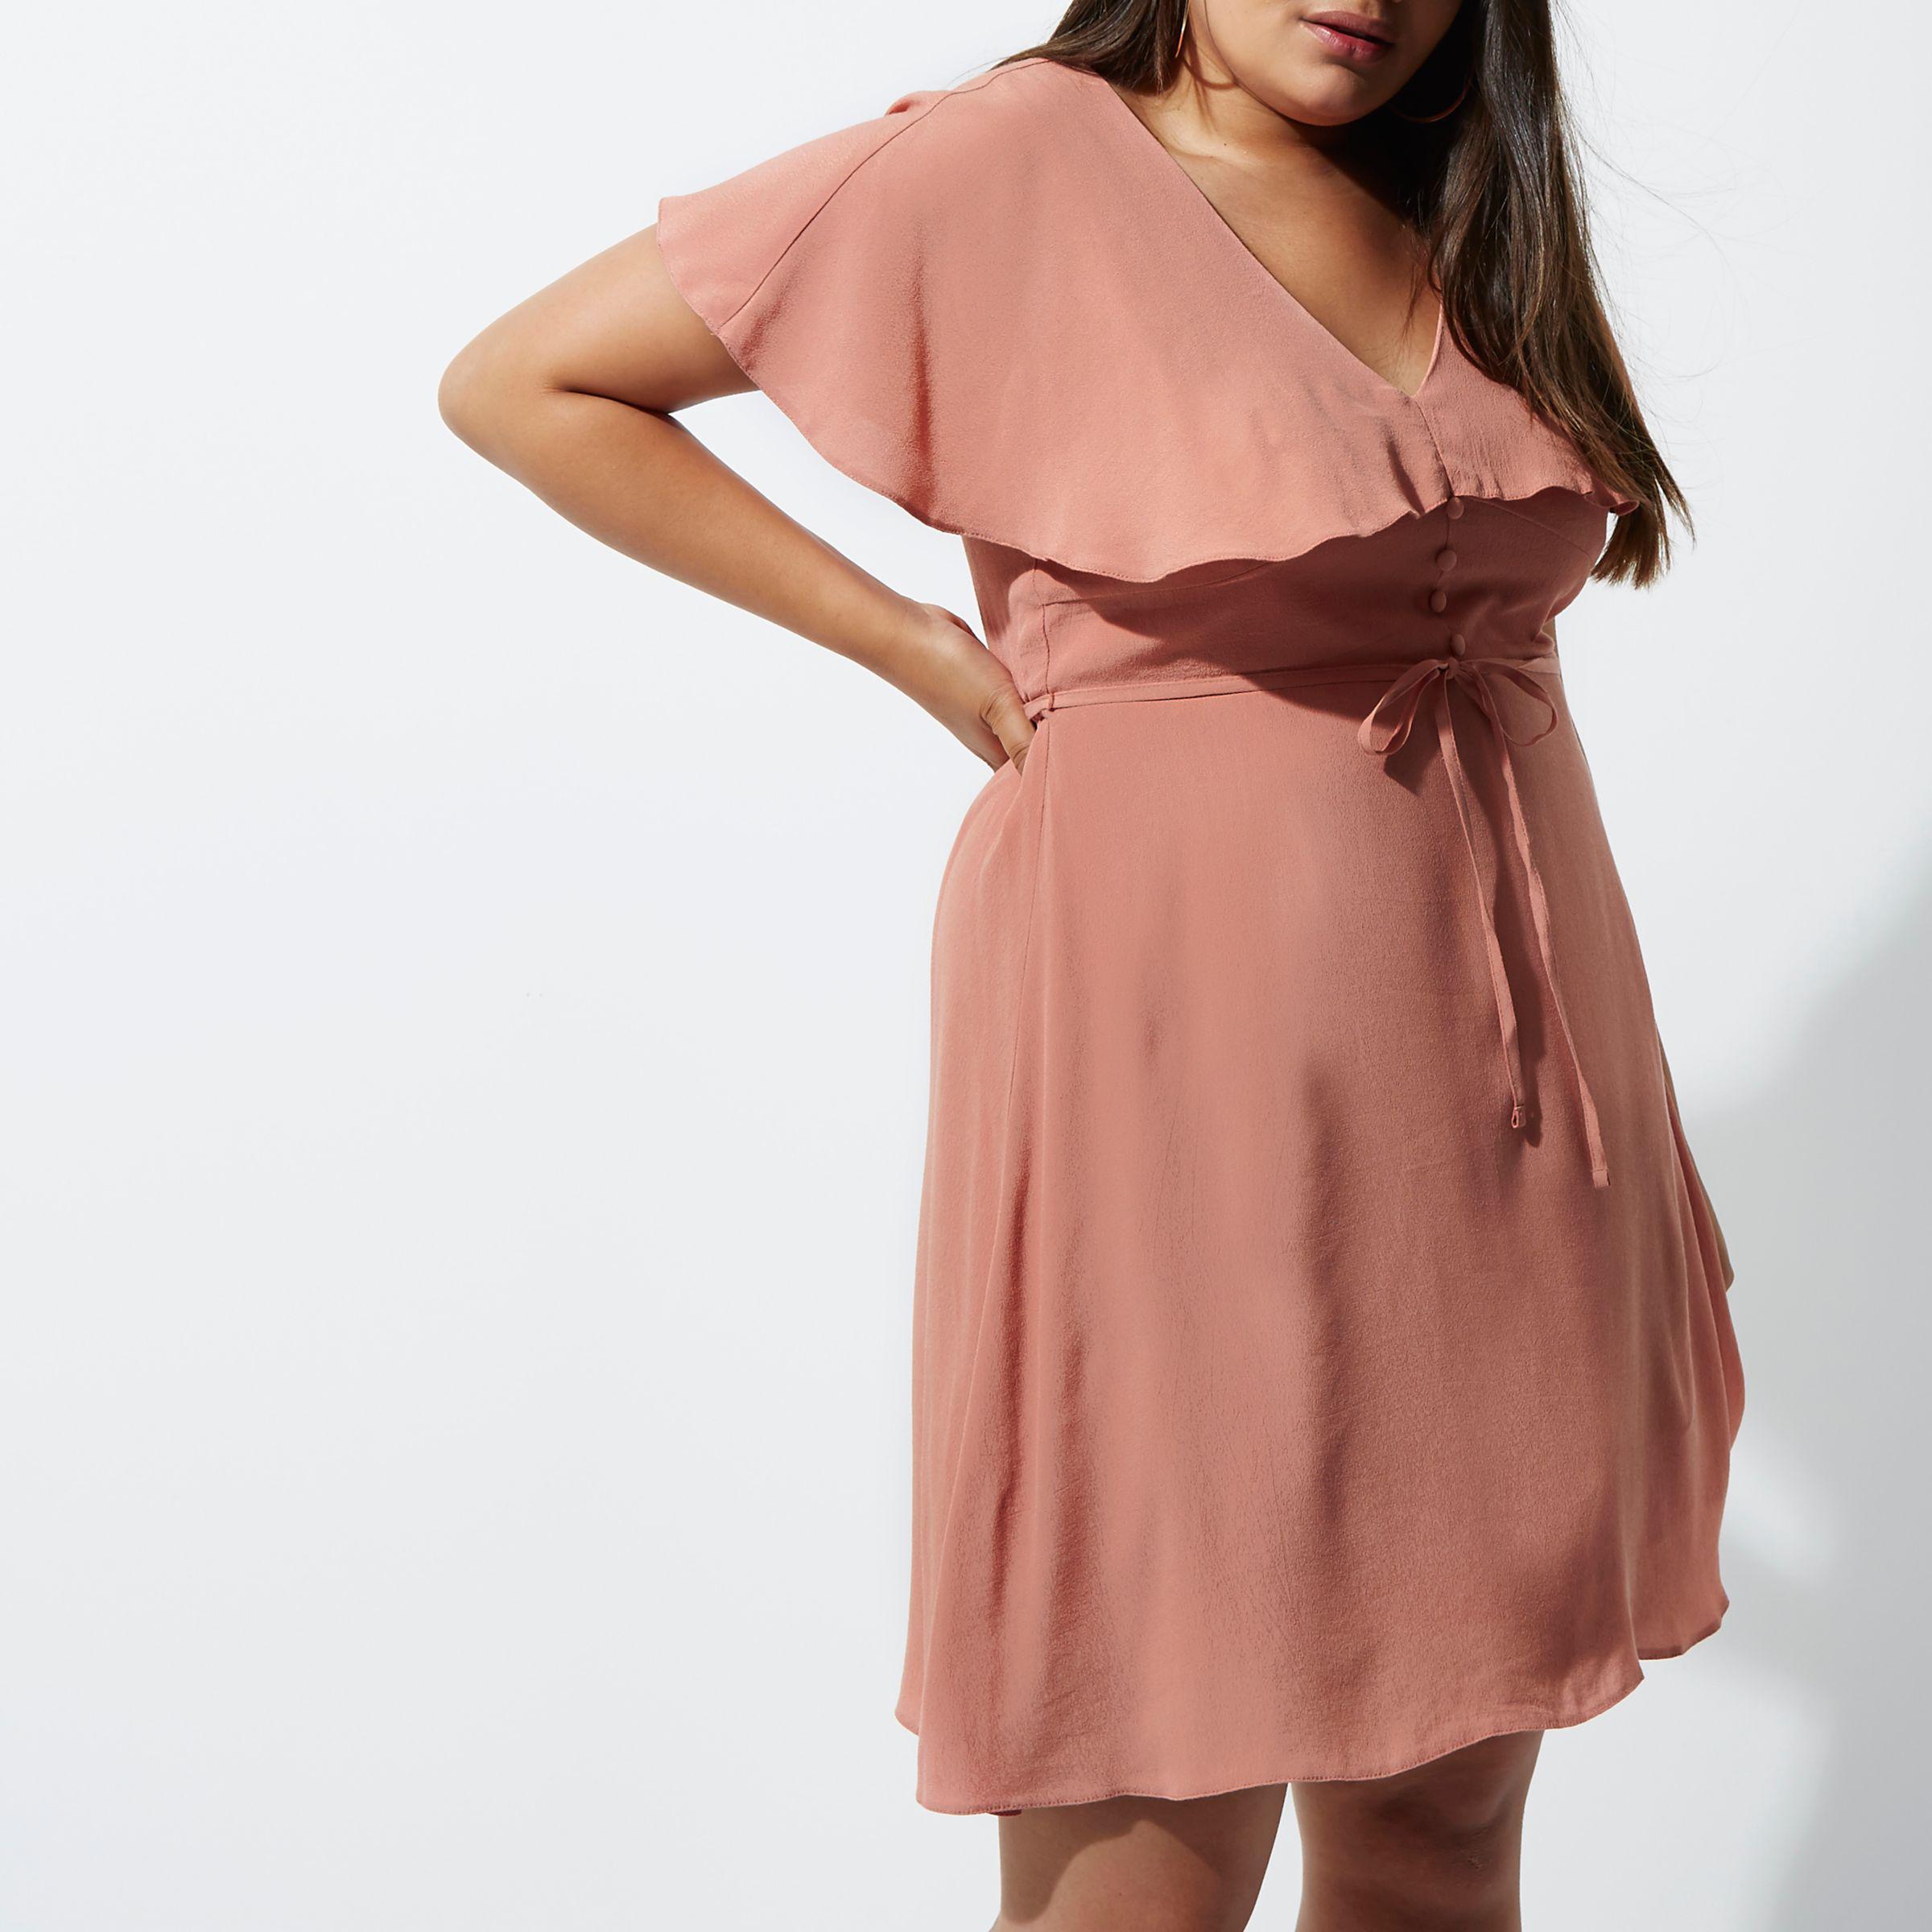 cb0afe6adff Maxi Dress Size 16 River Island